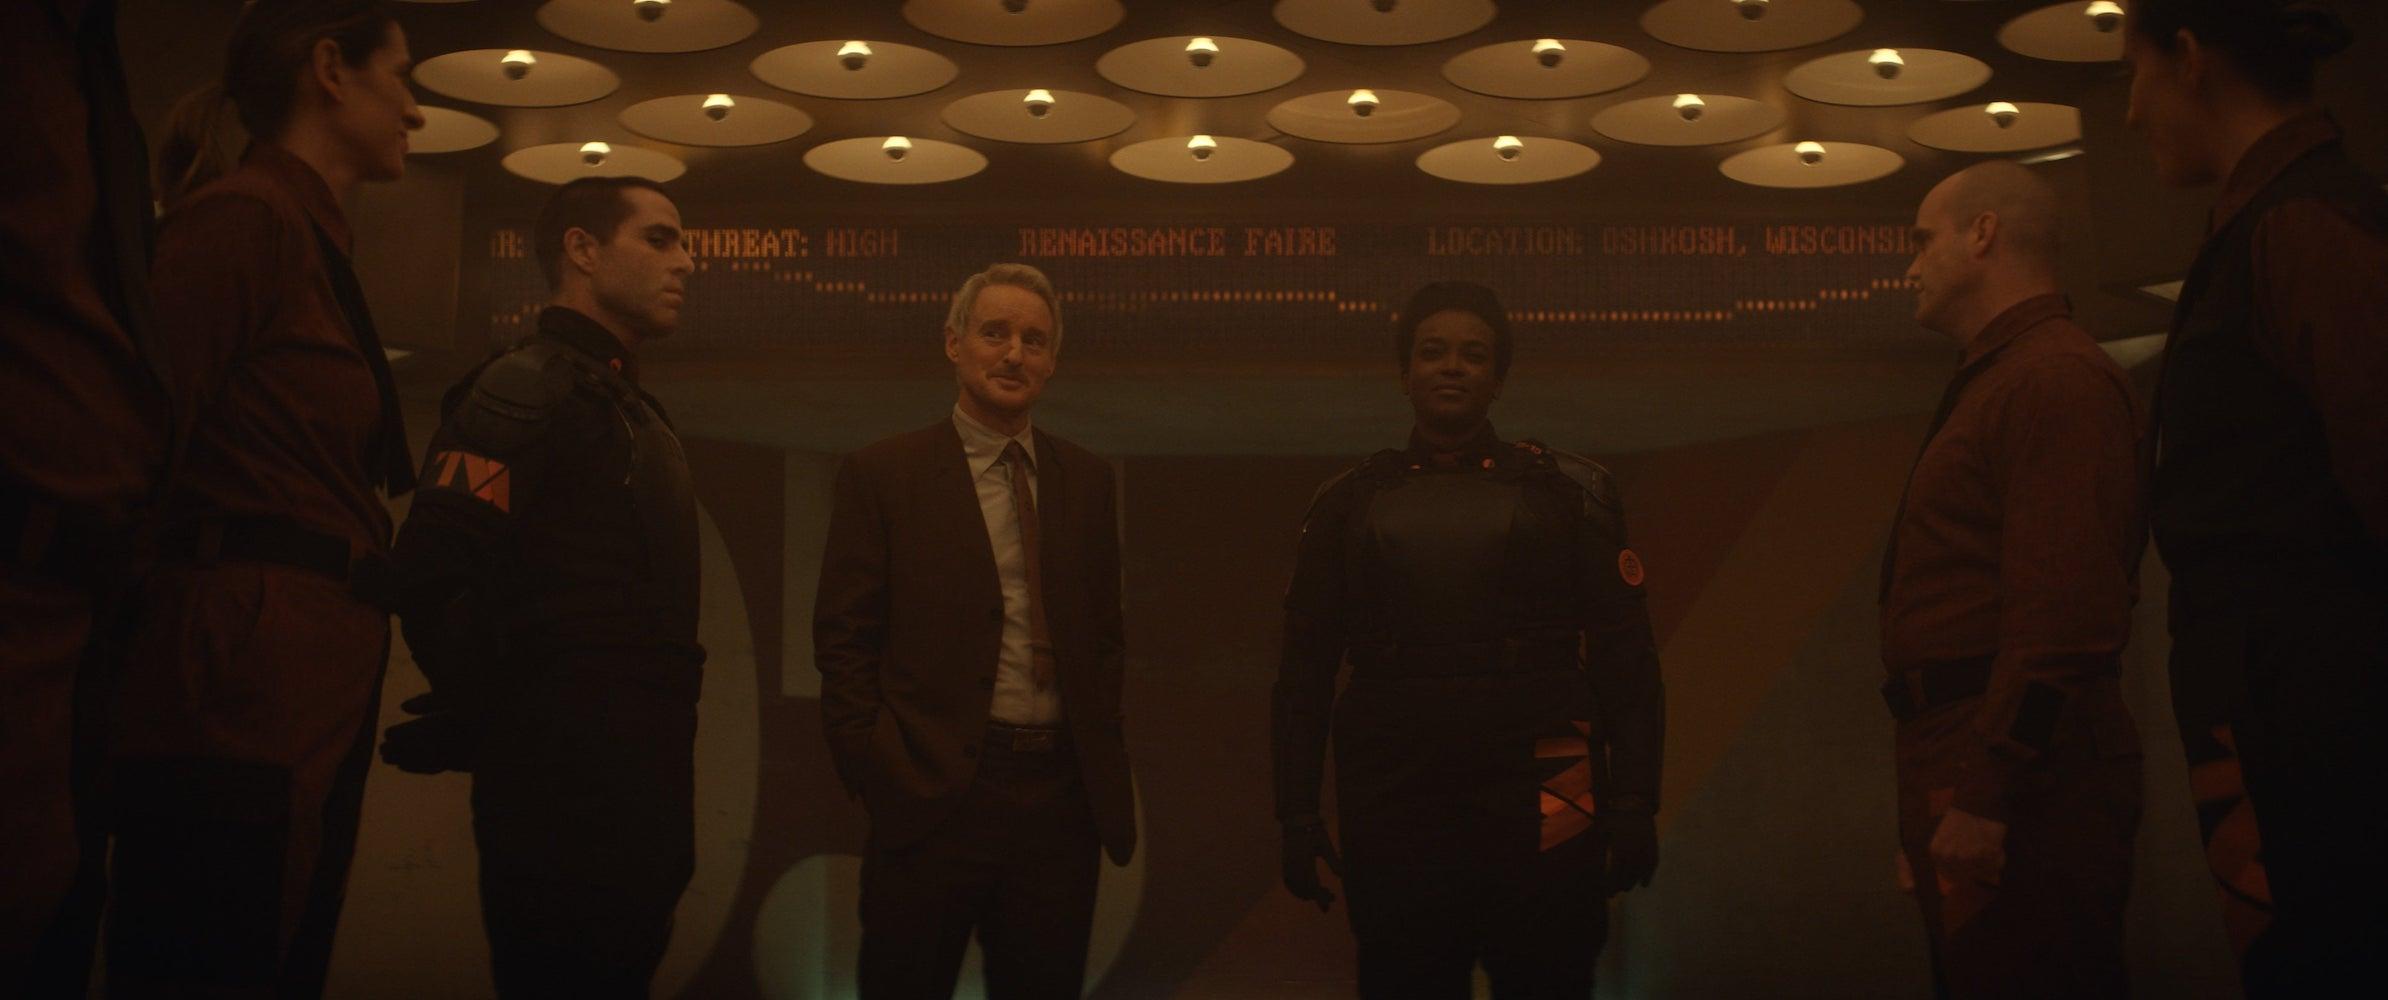 (L-R): Hunter D-90 (Neil Ellice), Mobius (Owen Wilson) and Hunter B-15 (Wunmi Mosaku) in Marvel Studios' LOKI, exclusively on Disney+. Photo courtesy of Marvel Studios. ©Marvel Studios 2021. All Rights Reserved.